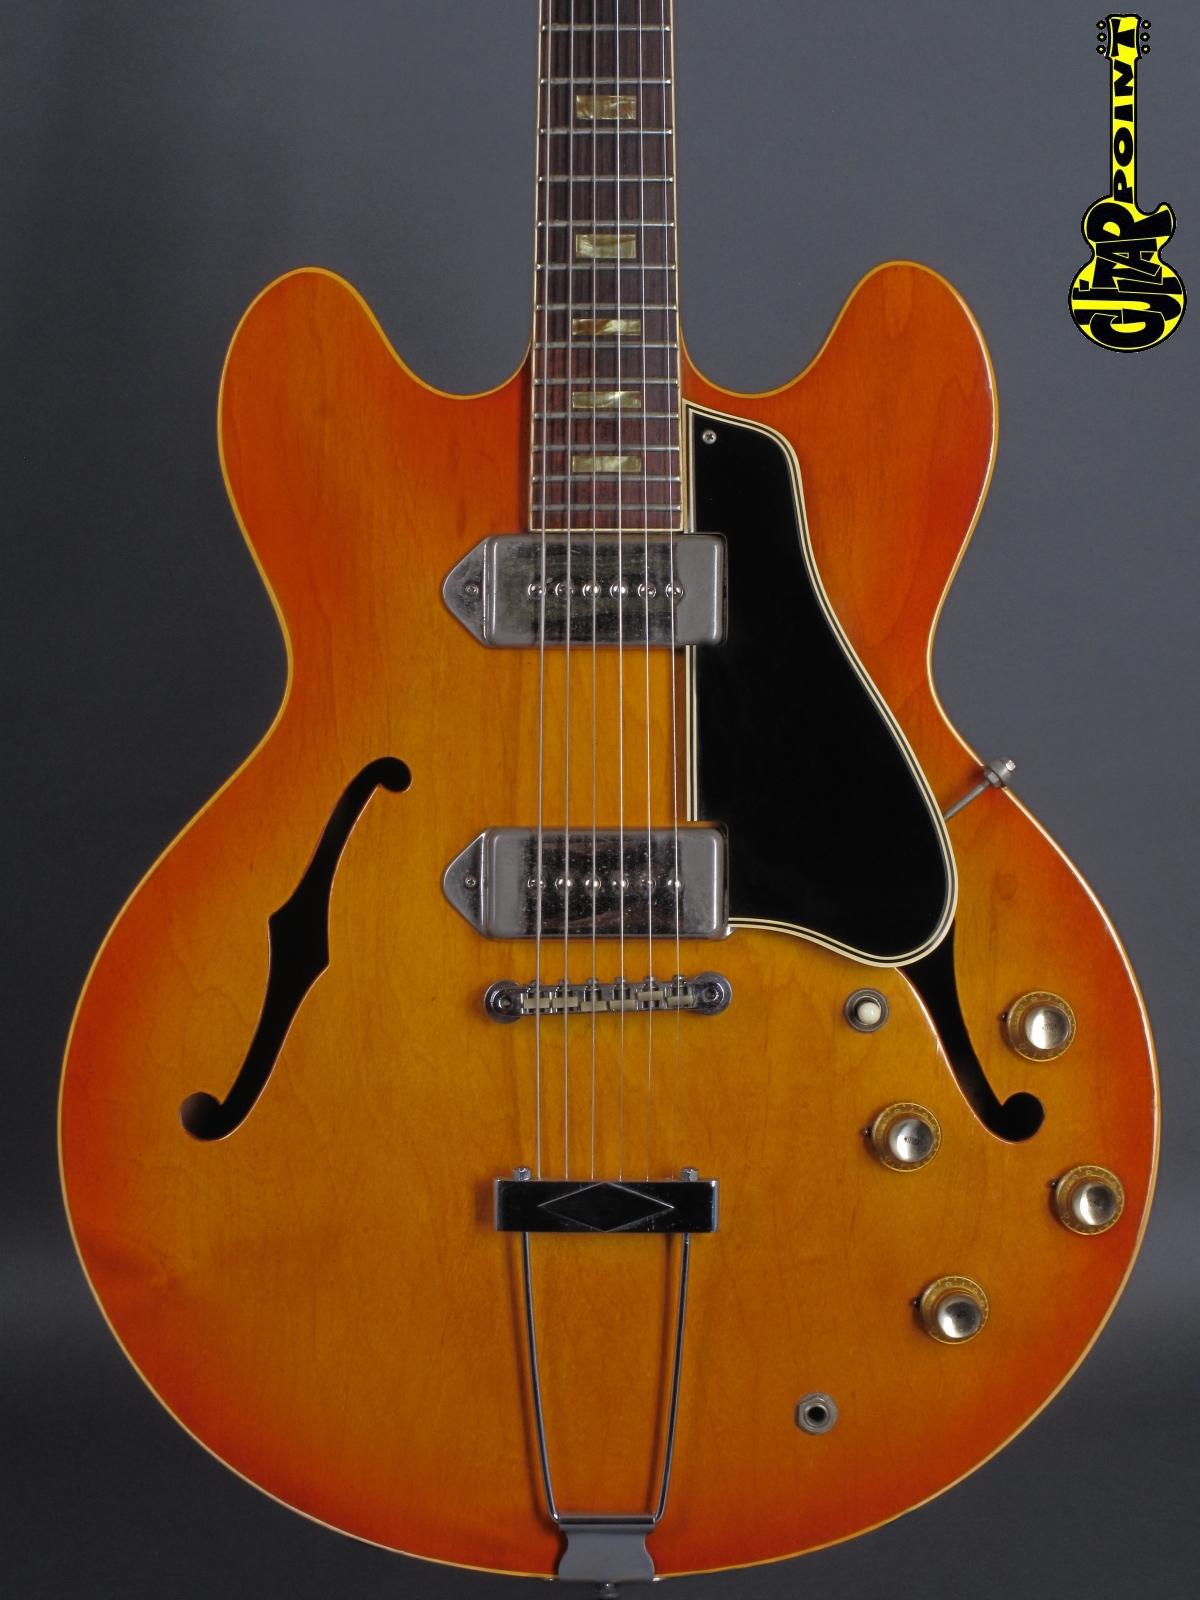 1966 Gibson ES-330 TD - Icetea Sunburst